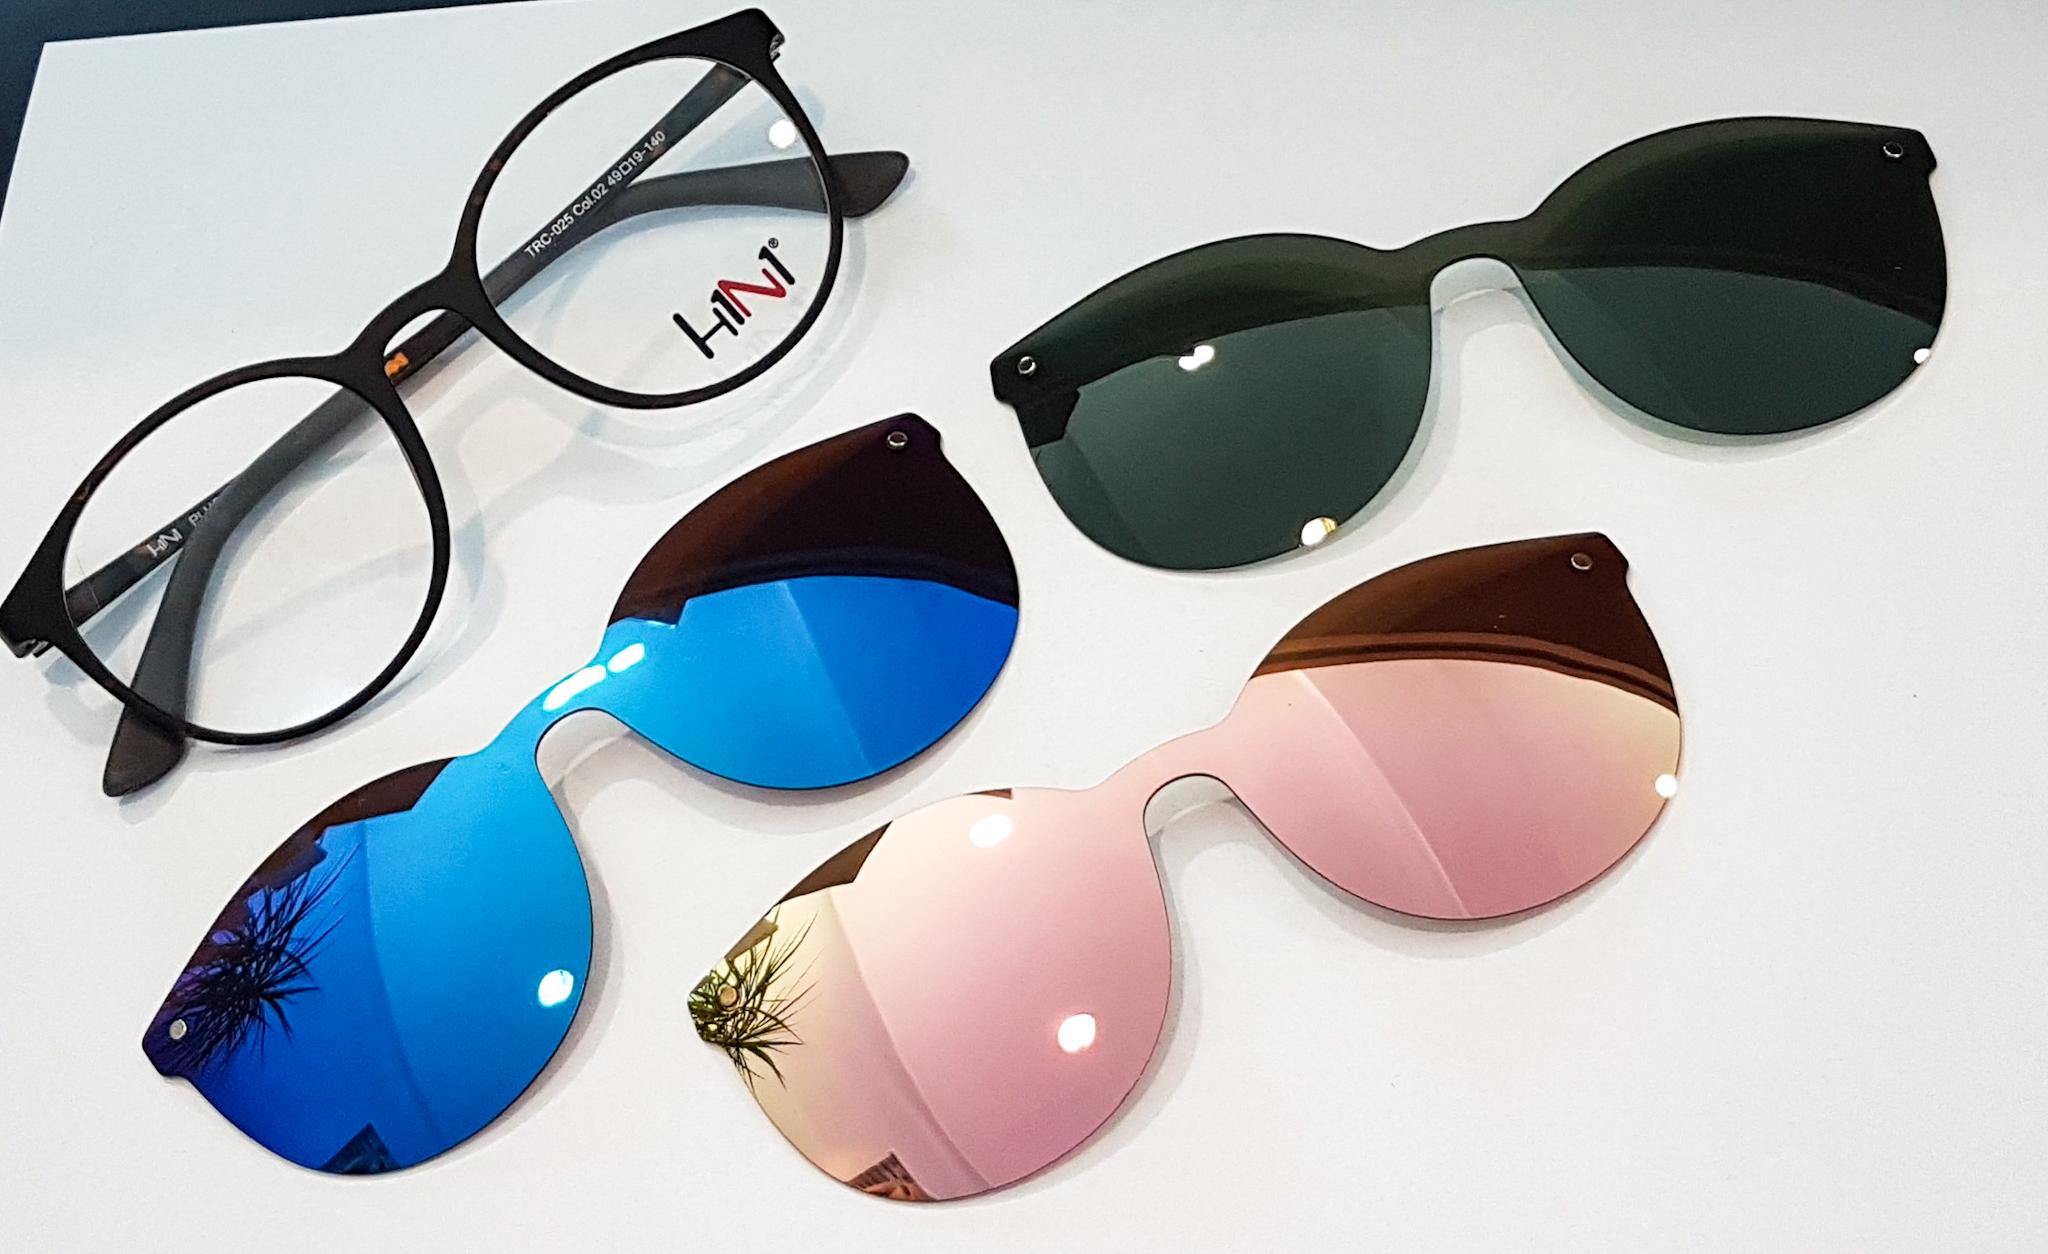 f886a000f8a2ae ... okulary z 3 nakładkami. %. 1903-2019-0108695115068892138726